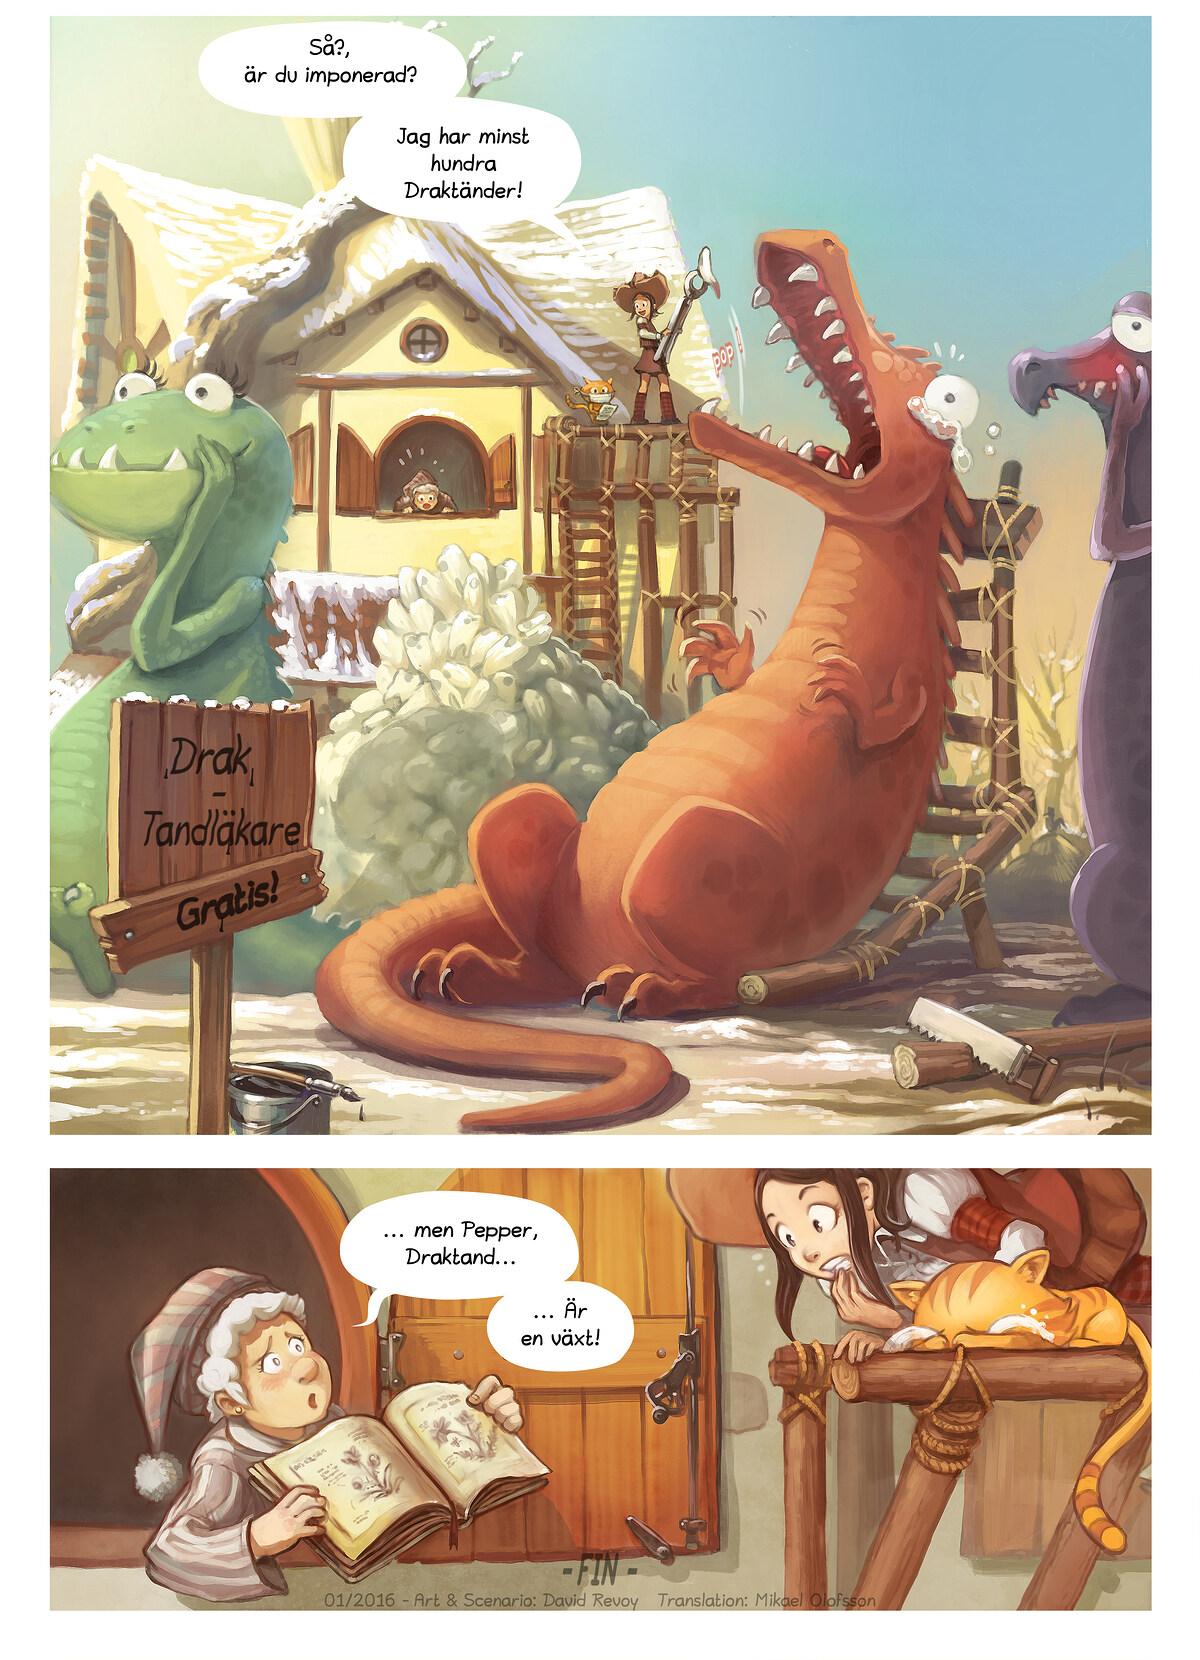 Episode 14: Draktanden, Page 6